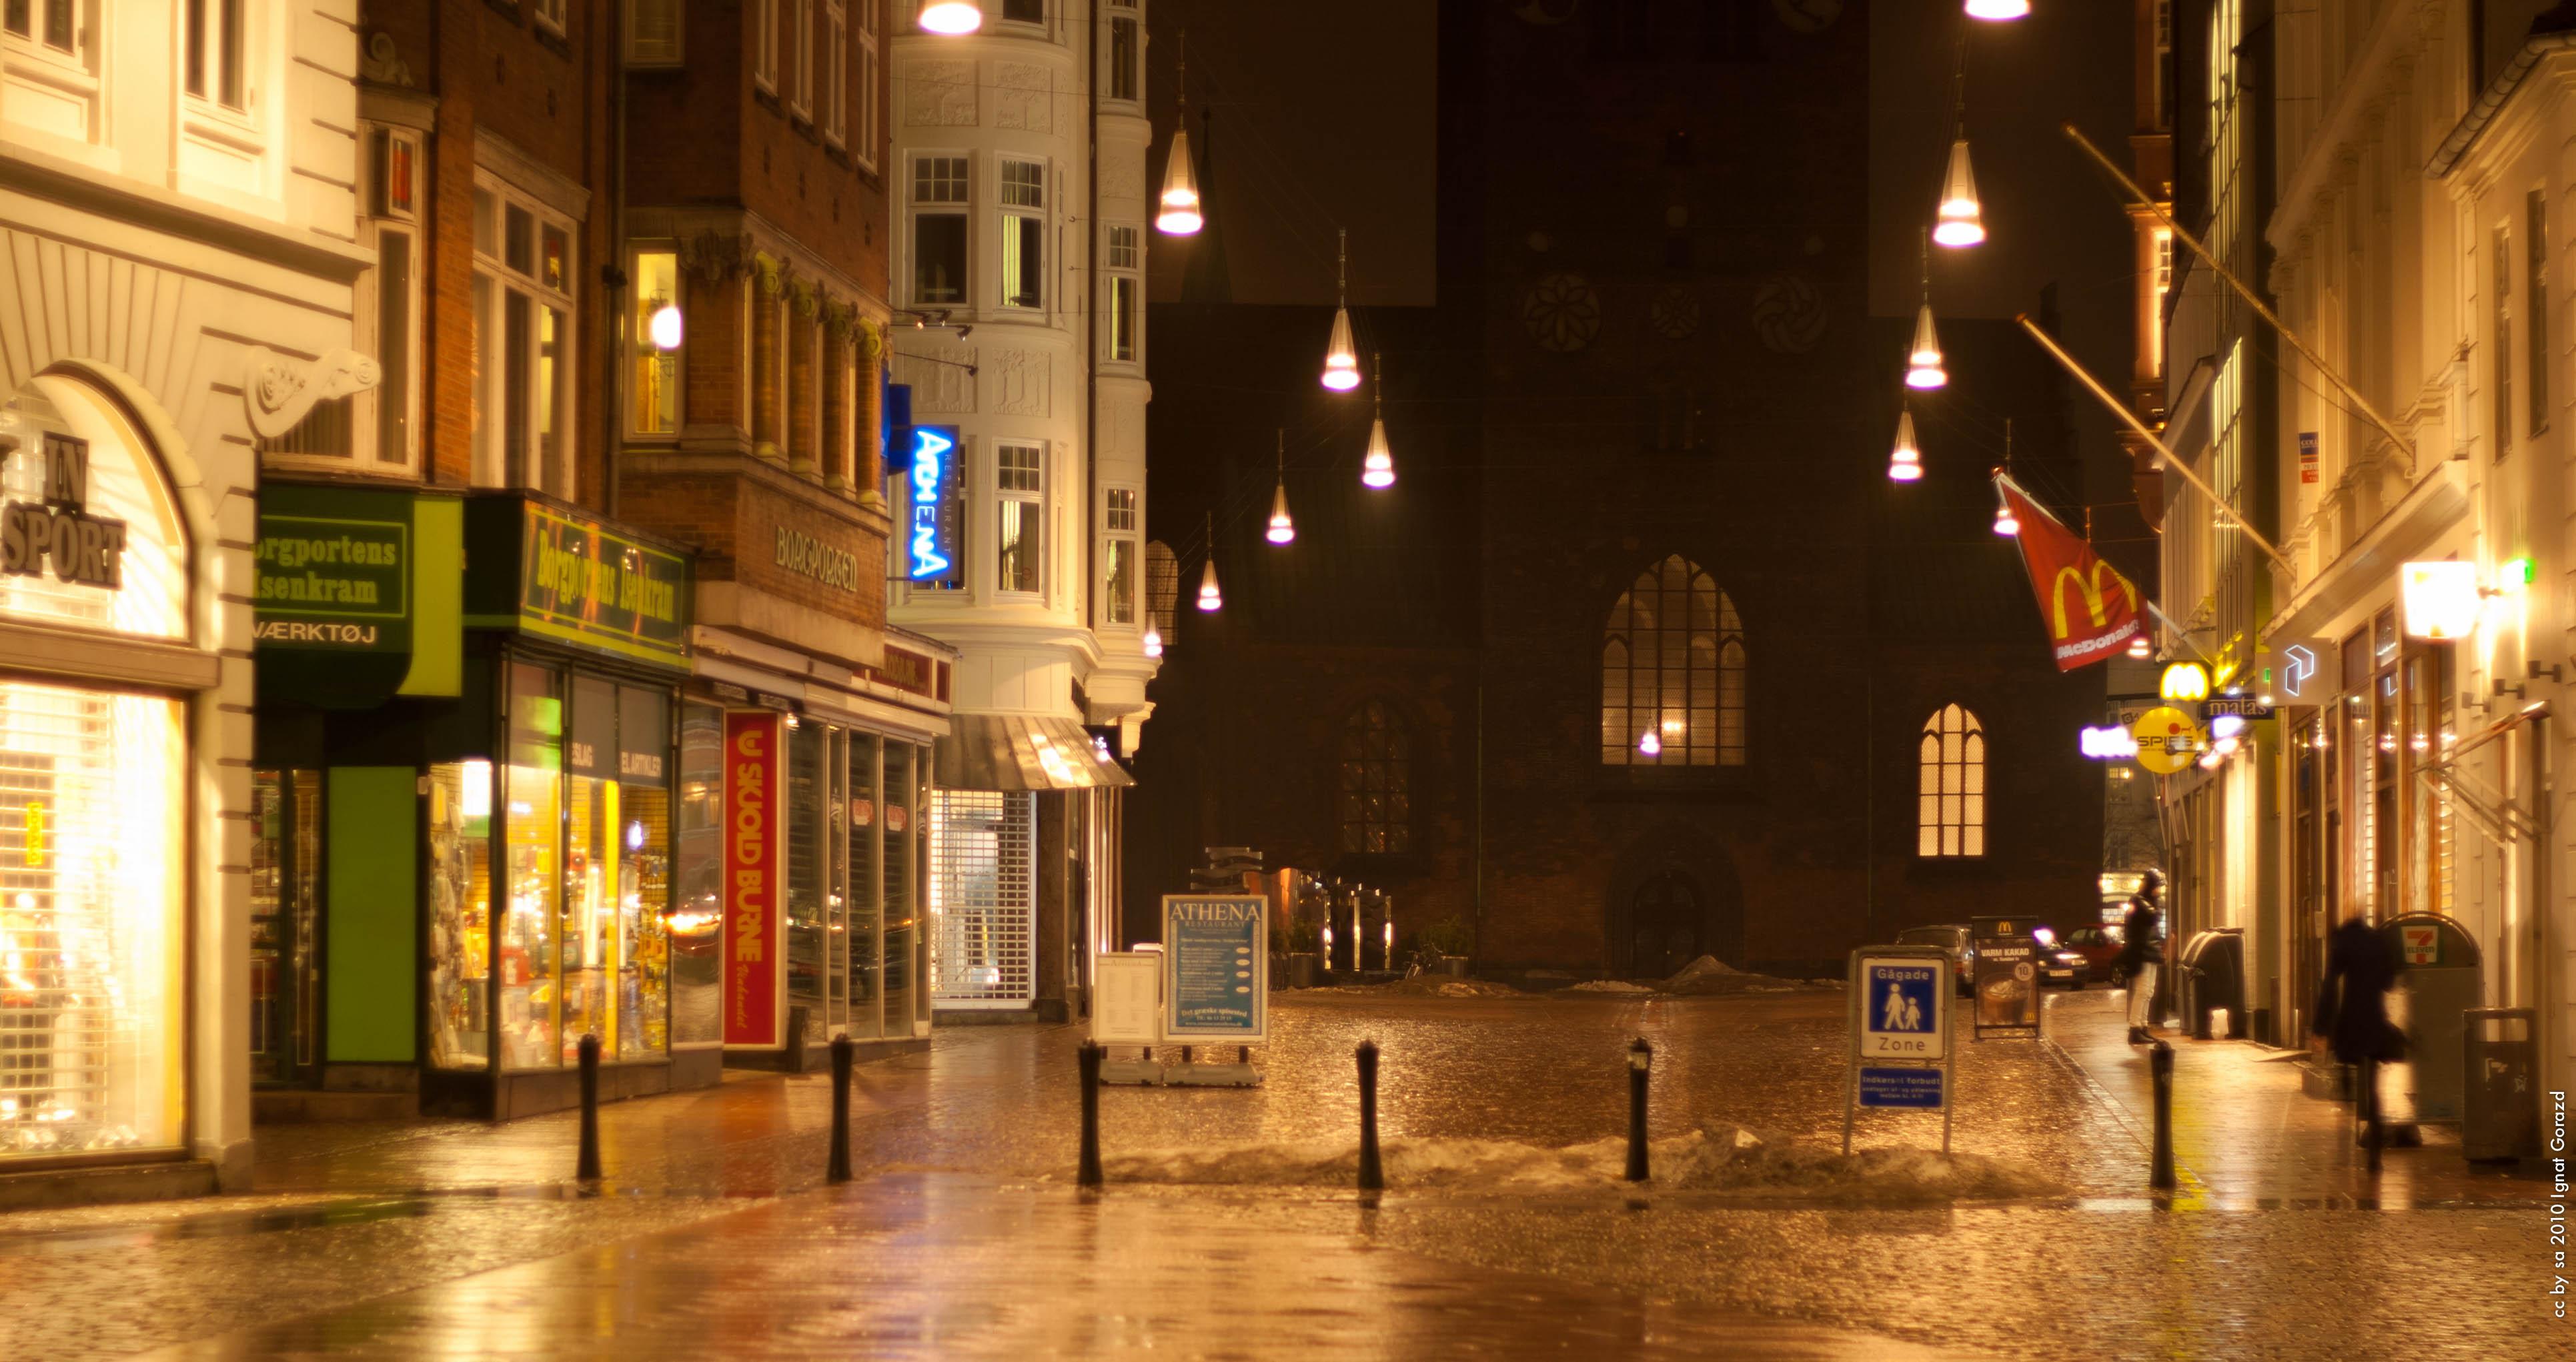 e48254c37b3e Fil Store Torv by night.jpg - Wikipedia